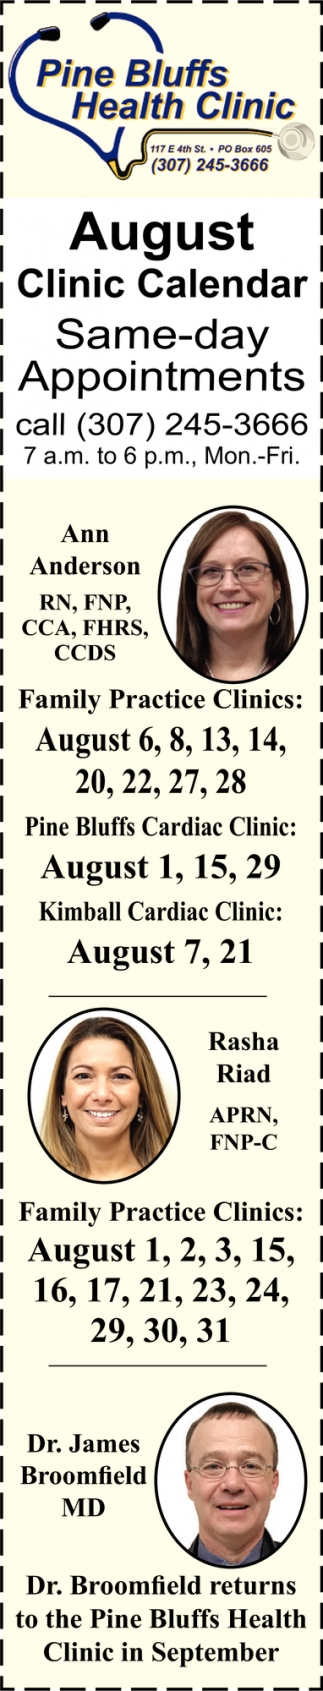 August Clinic Calendar